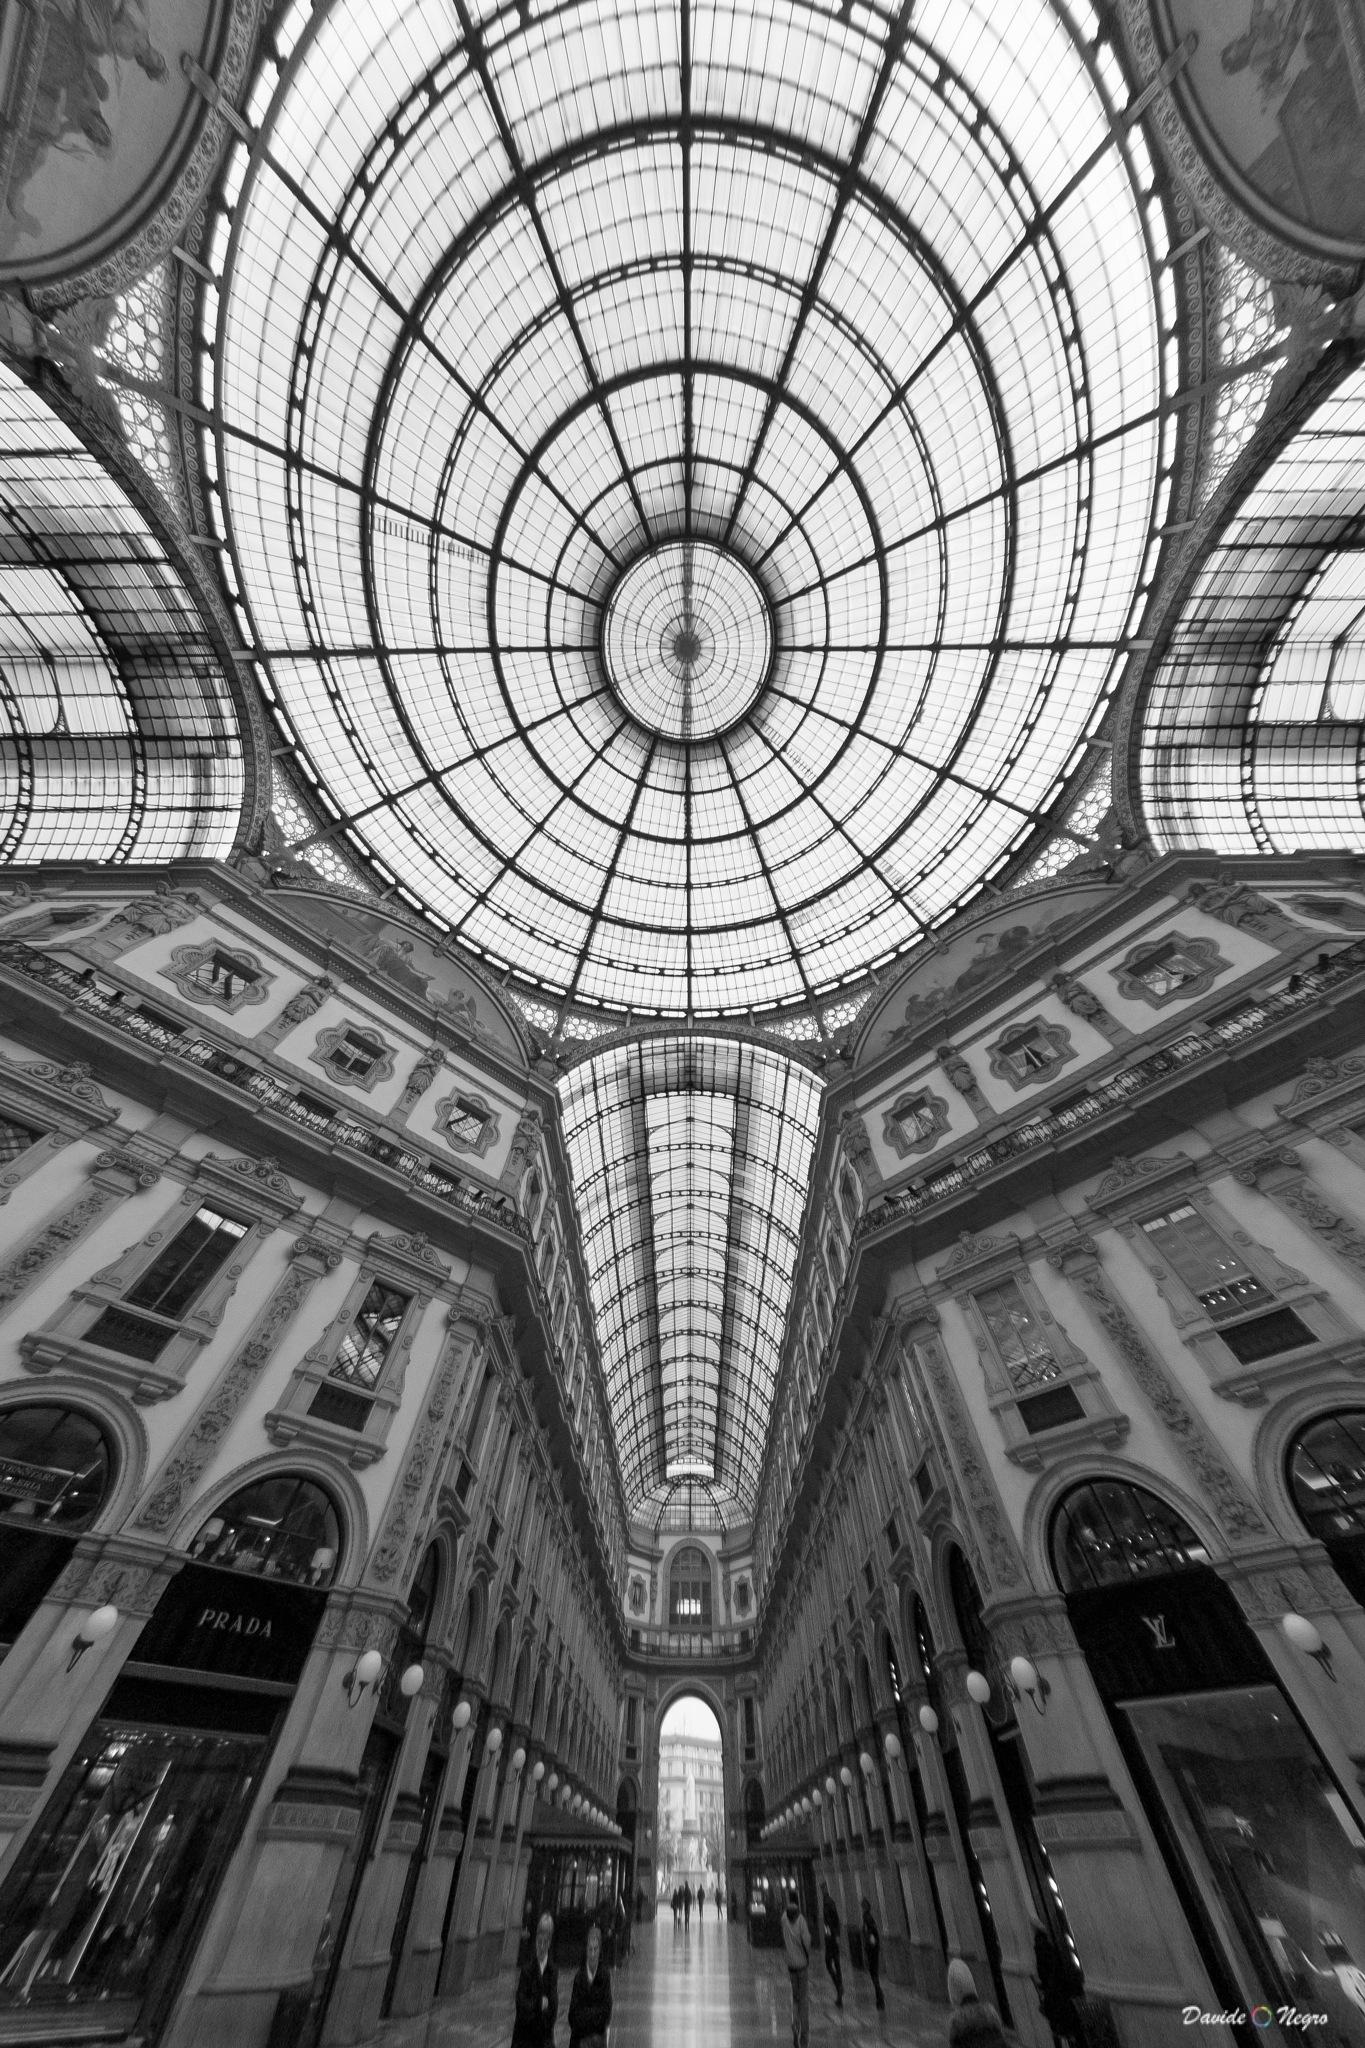 galleria by DavideNegro